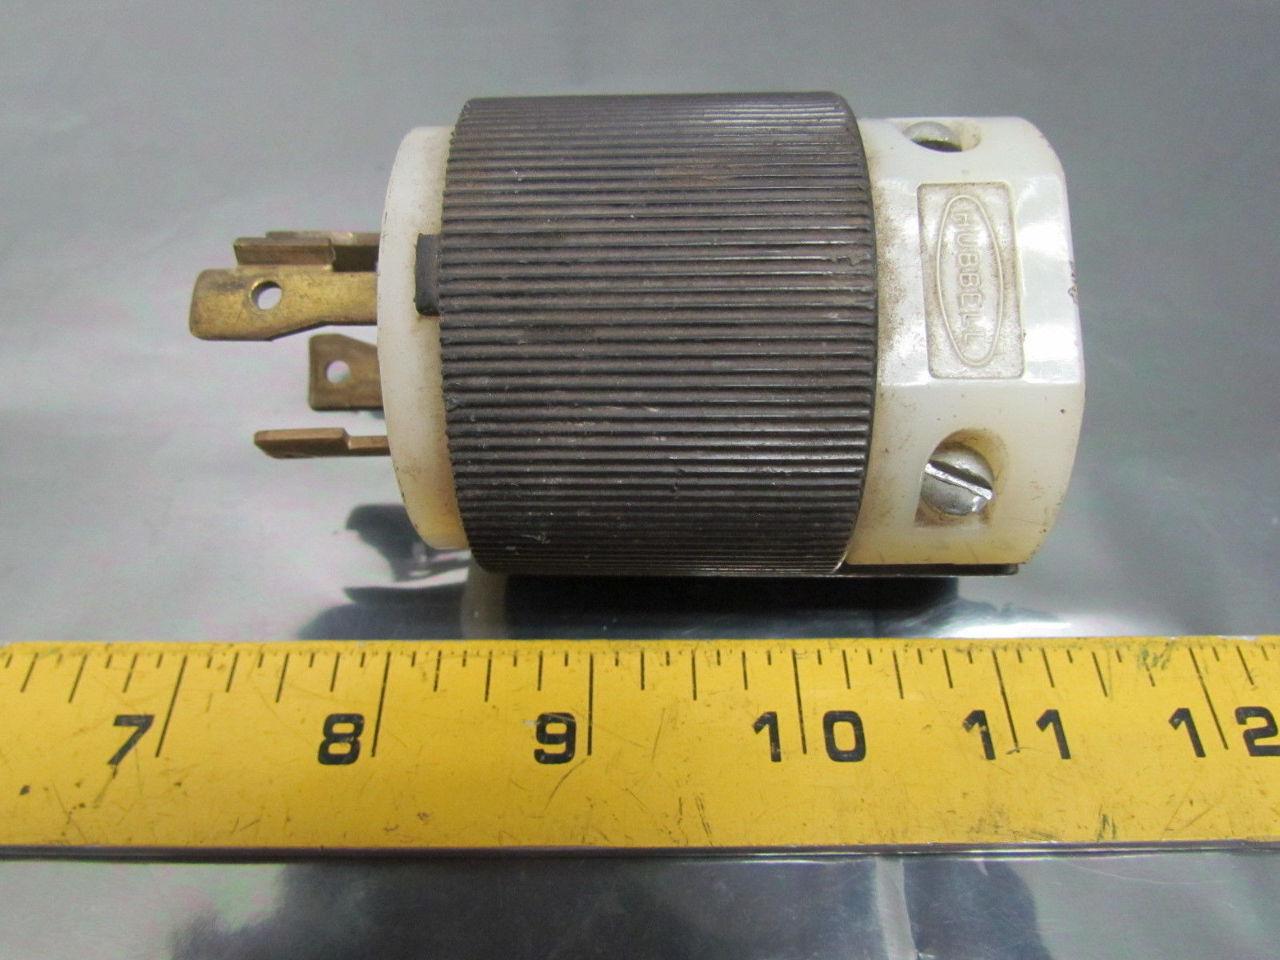 Hubbell 231a 30a 600vac 3 Pole 4 Wire Nema L1730 Twist Lock Connector